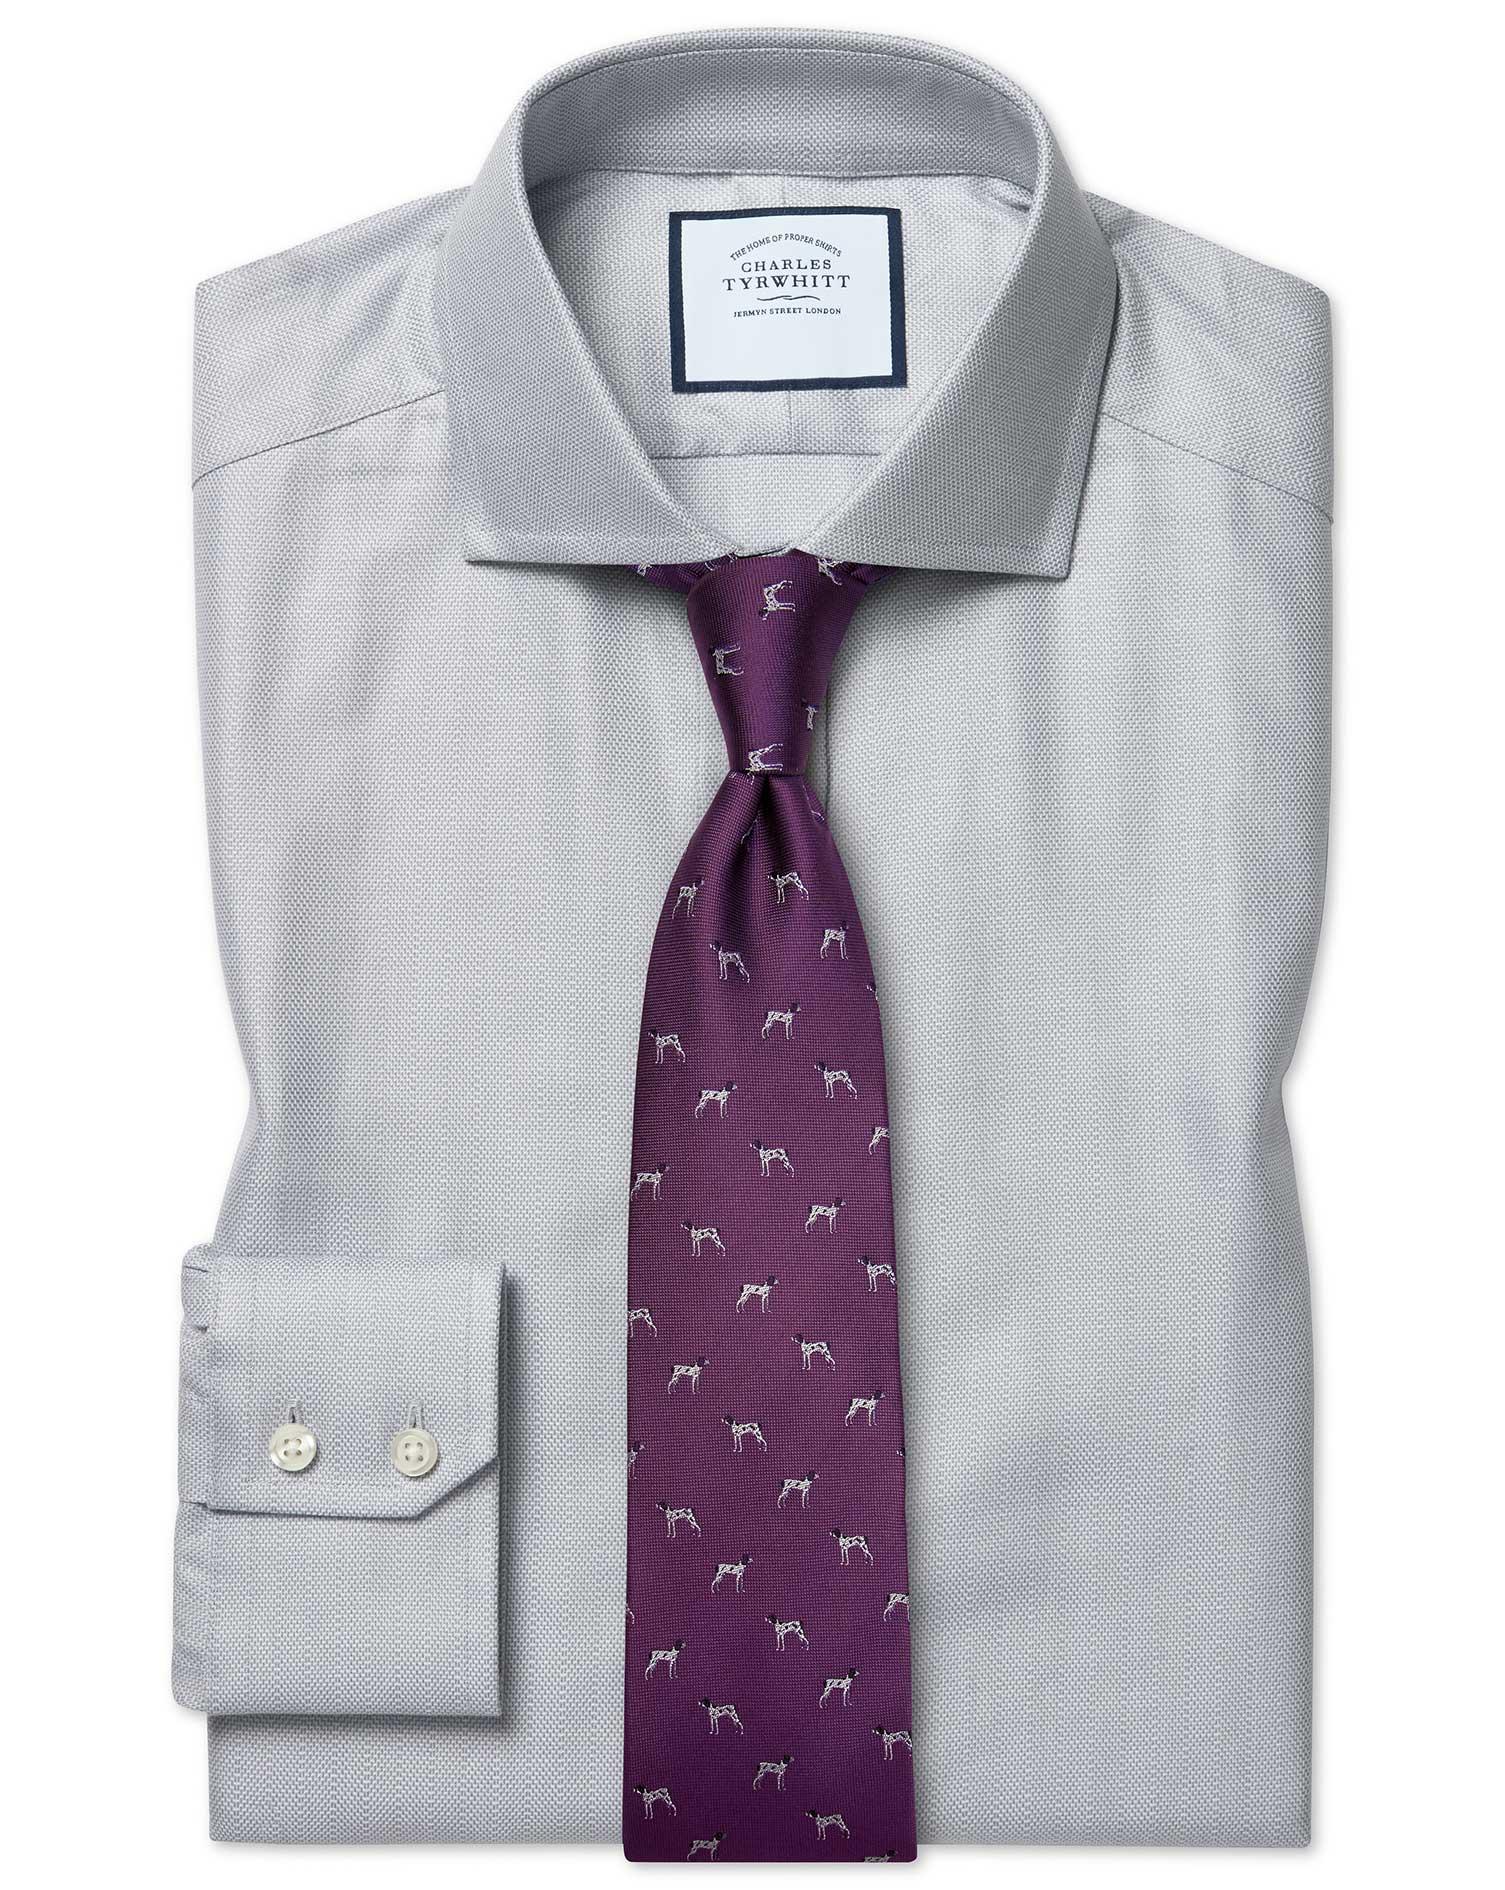 Slim Fit Cutaway Cotton Stretch With Tencel™ Grey Cotton Tencel Formal Shirt Single Cuff Size